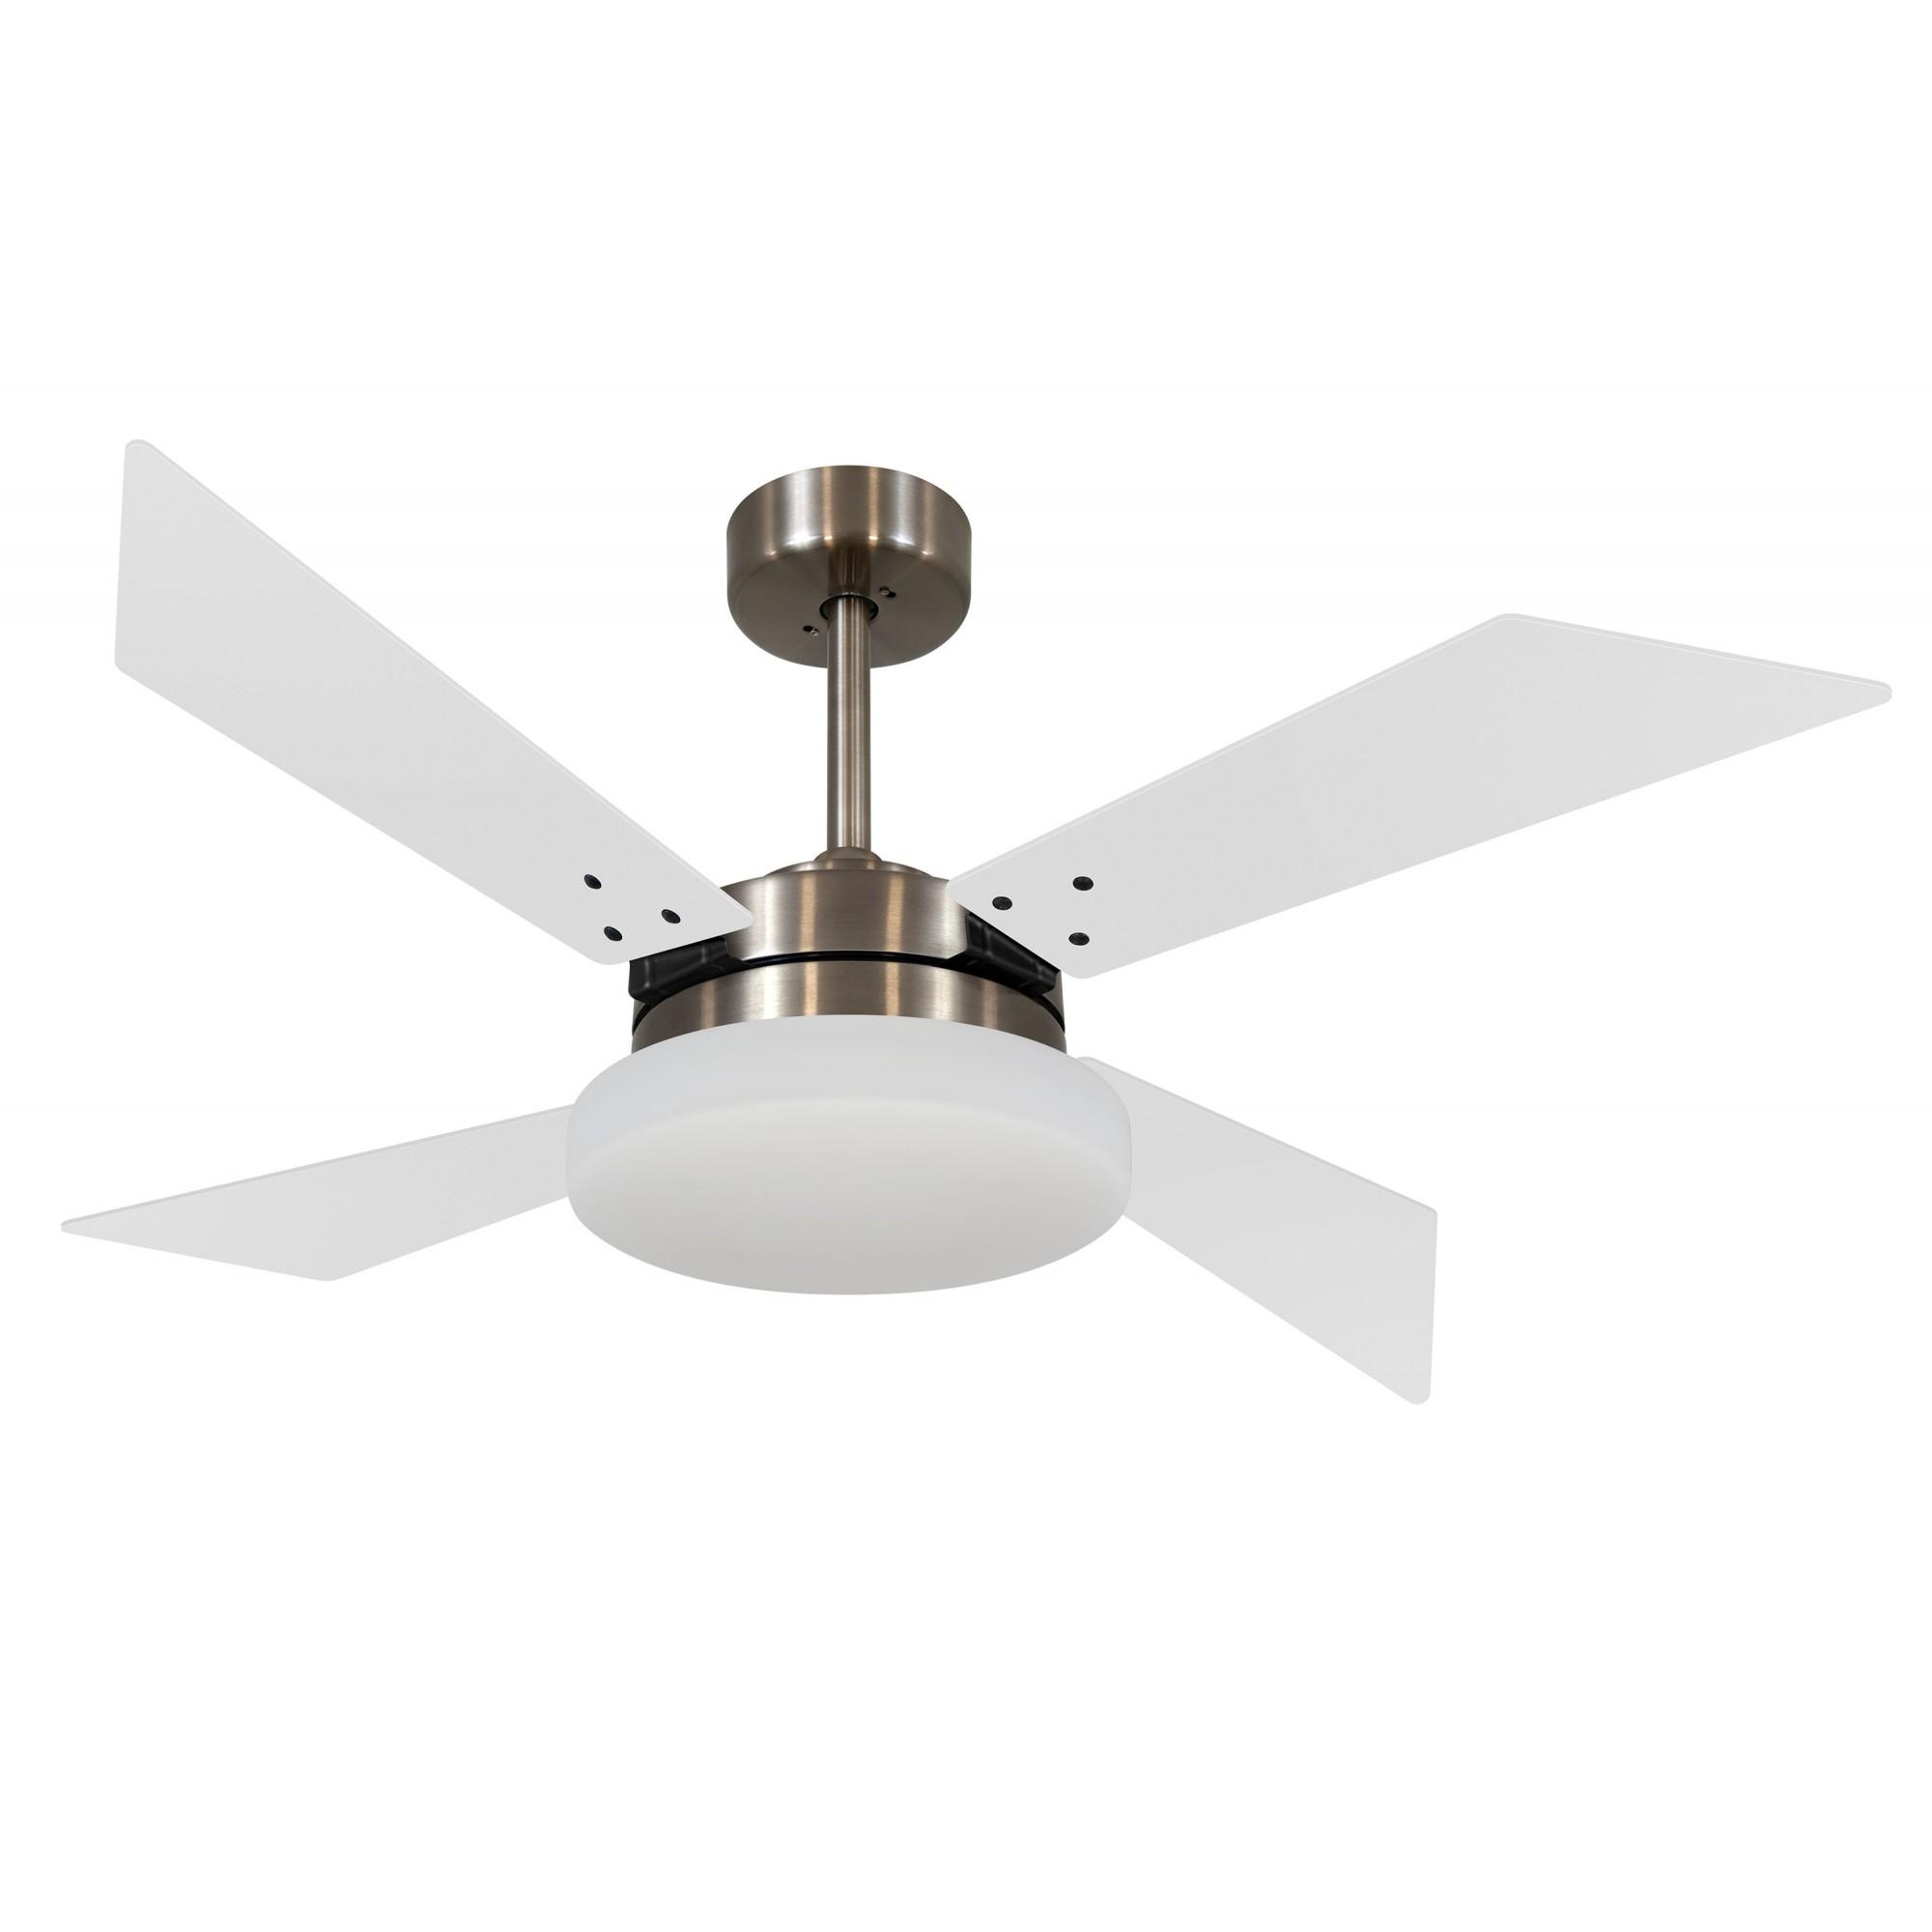 Ventilador de Teto VD50 Tech Bronze 4 Pás MDF Branco 220V